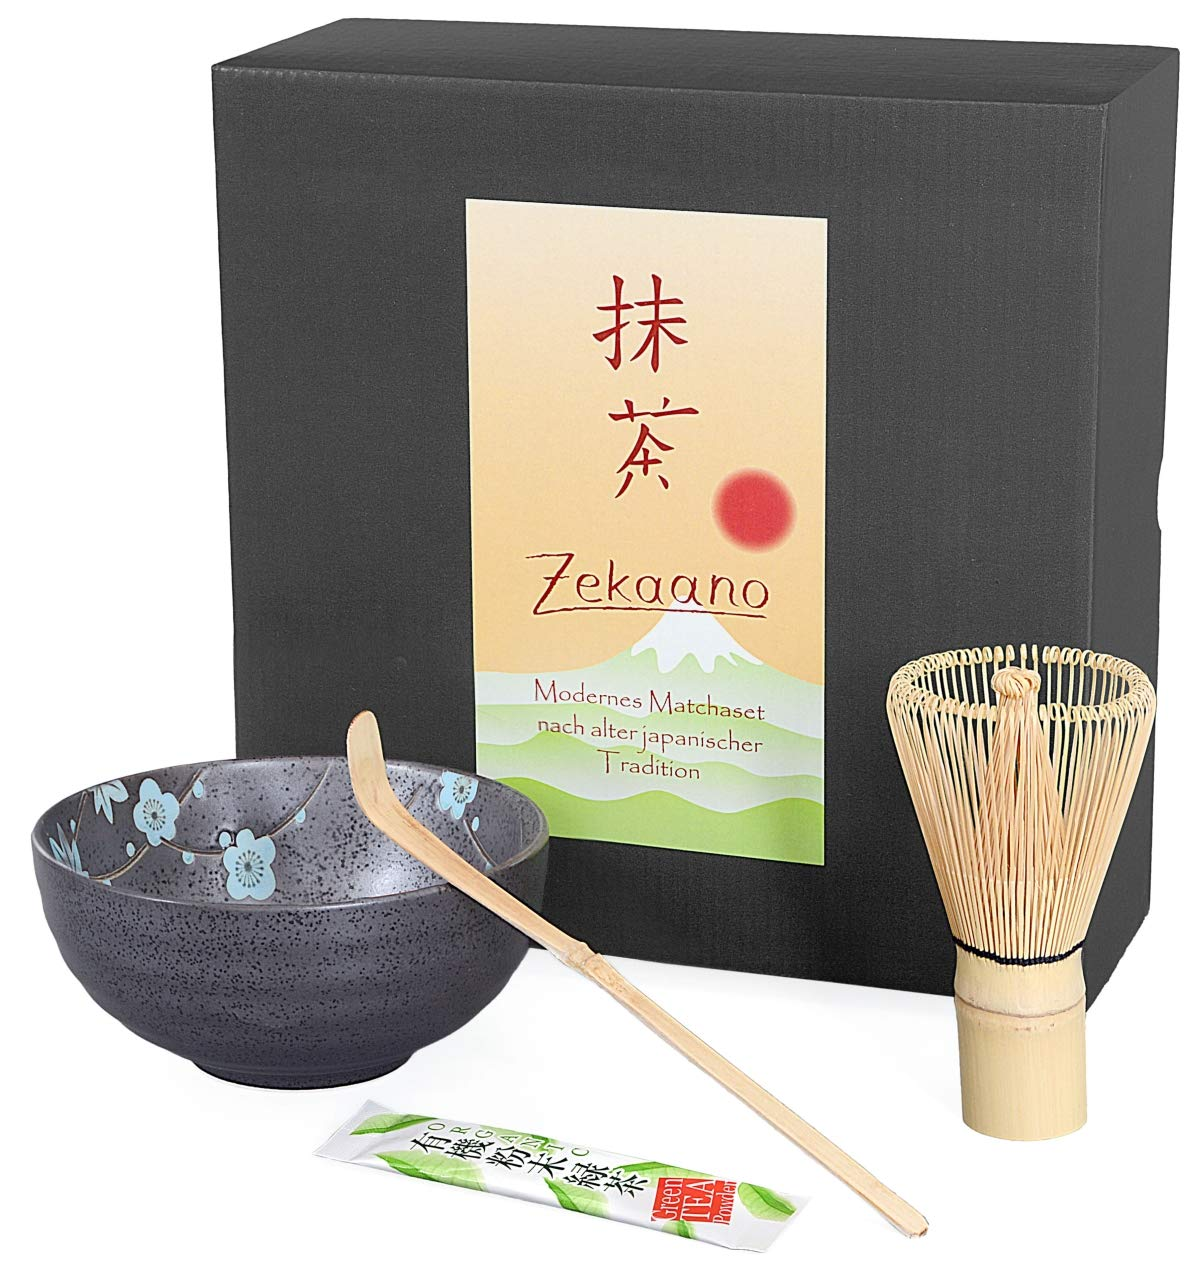 Aricola® Bamboo Spoon Matcha 3 piece set, 300 ml anthracite, blue, dappled, Matcha bowl, Matcha bamboo brush in gift box